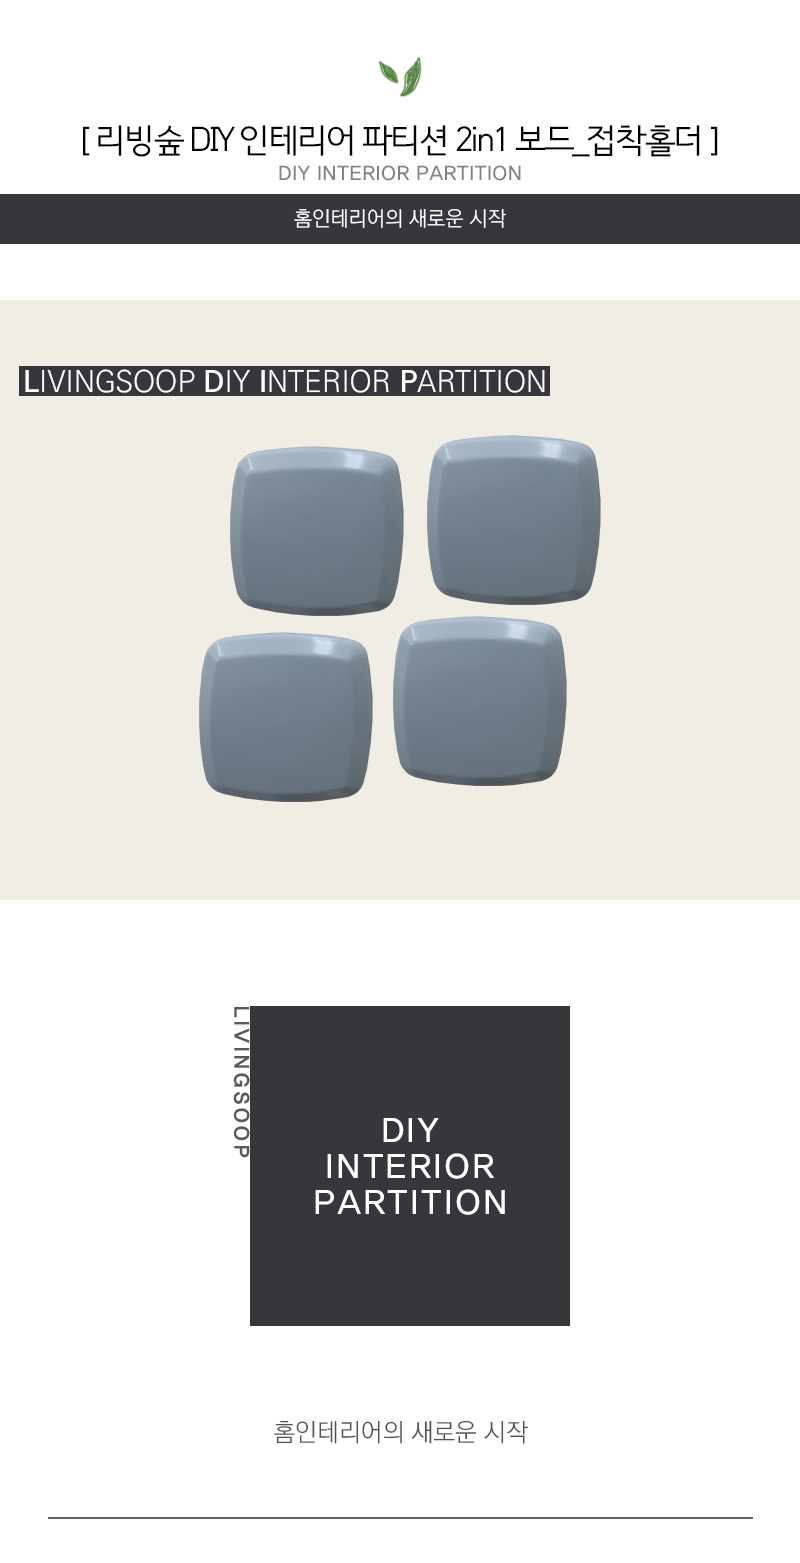 DIY 인테리어 2in1보드 접착용 홀더 세트 - 리빙숲, 2,900원, 정리/리빙박스, 소품정리함